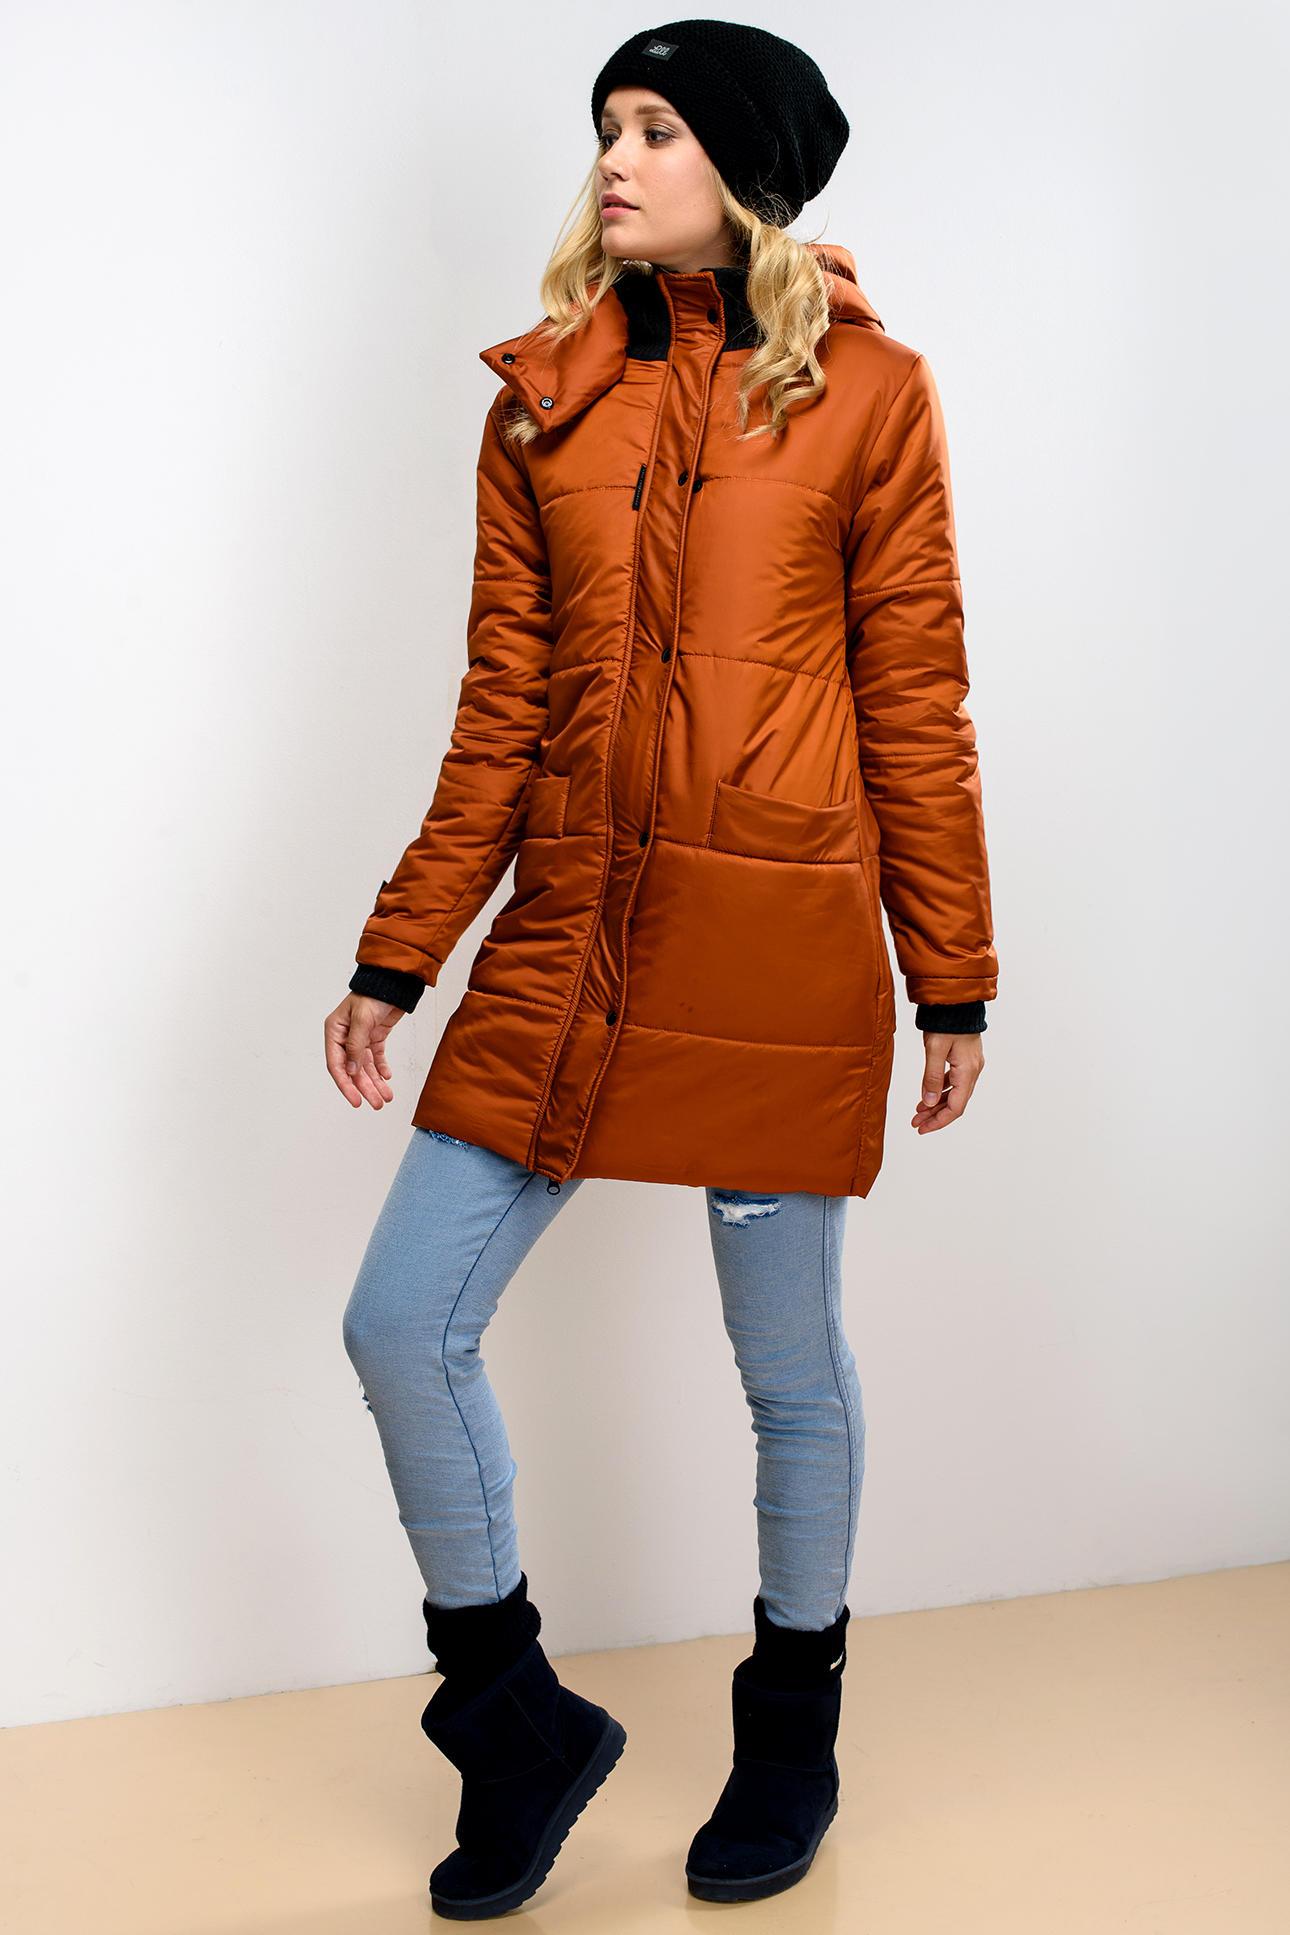 Zimná bunda Wicked - Lull.sk 2298a03bedd